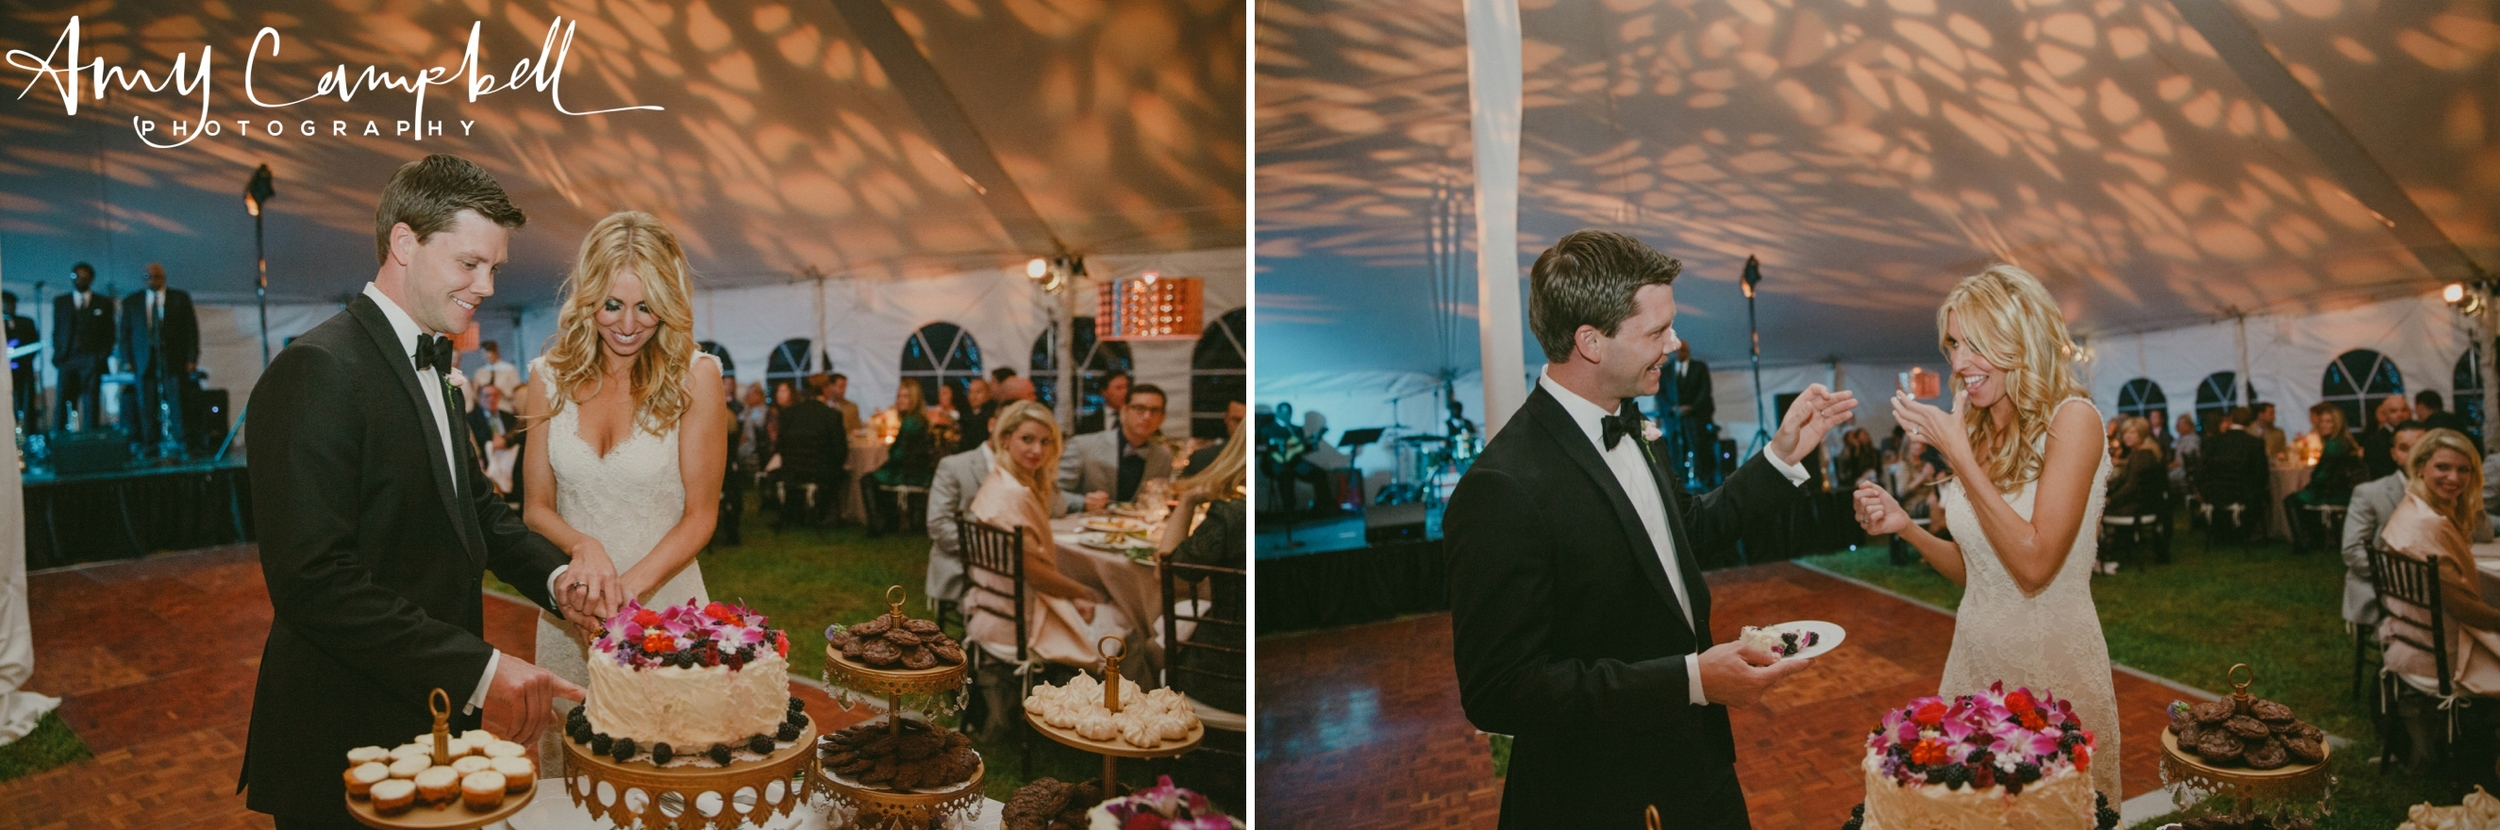 CoreyandTanner_wed_fb_amycampbellphotography_0052.jpg